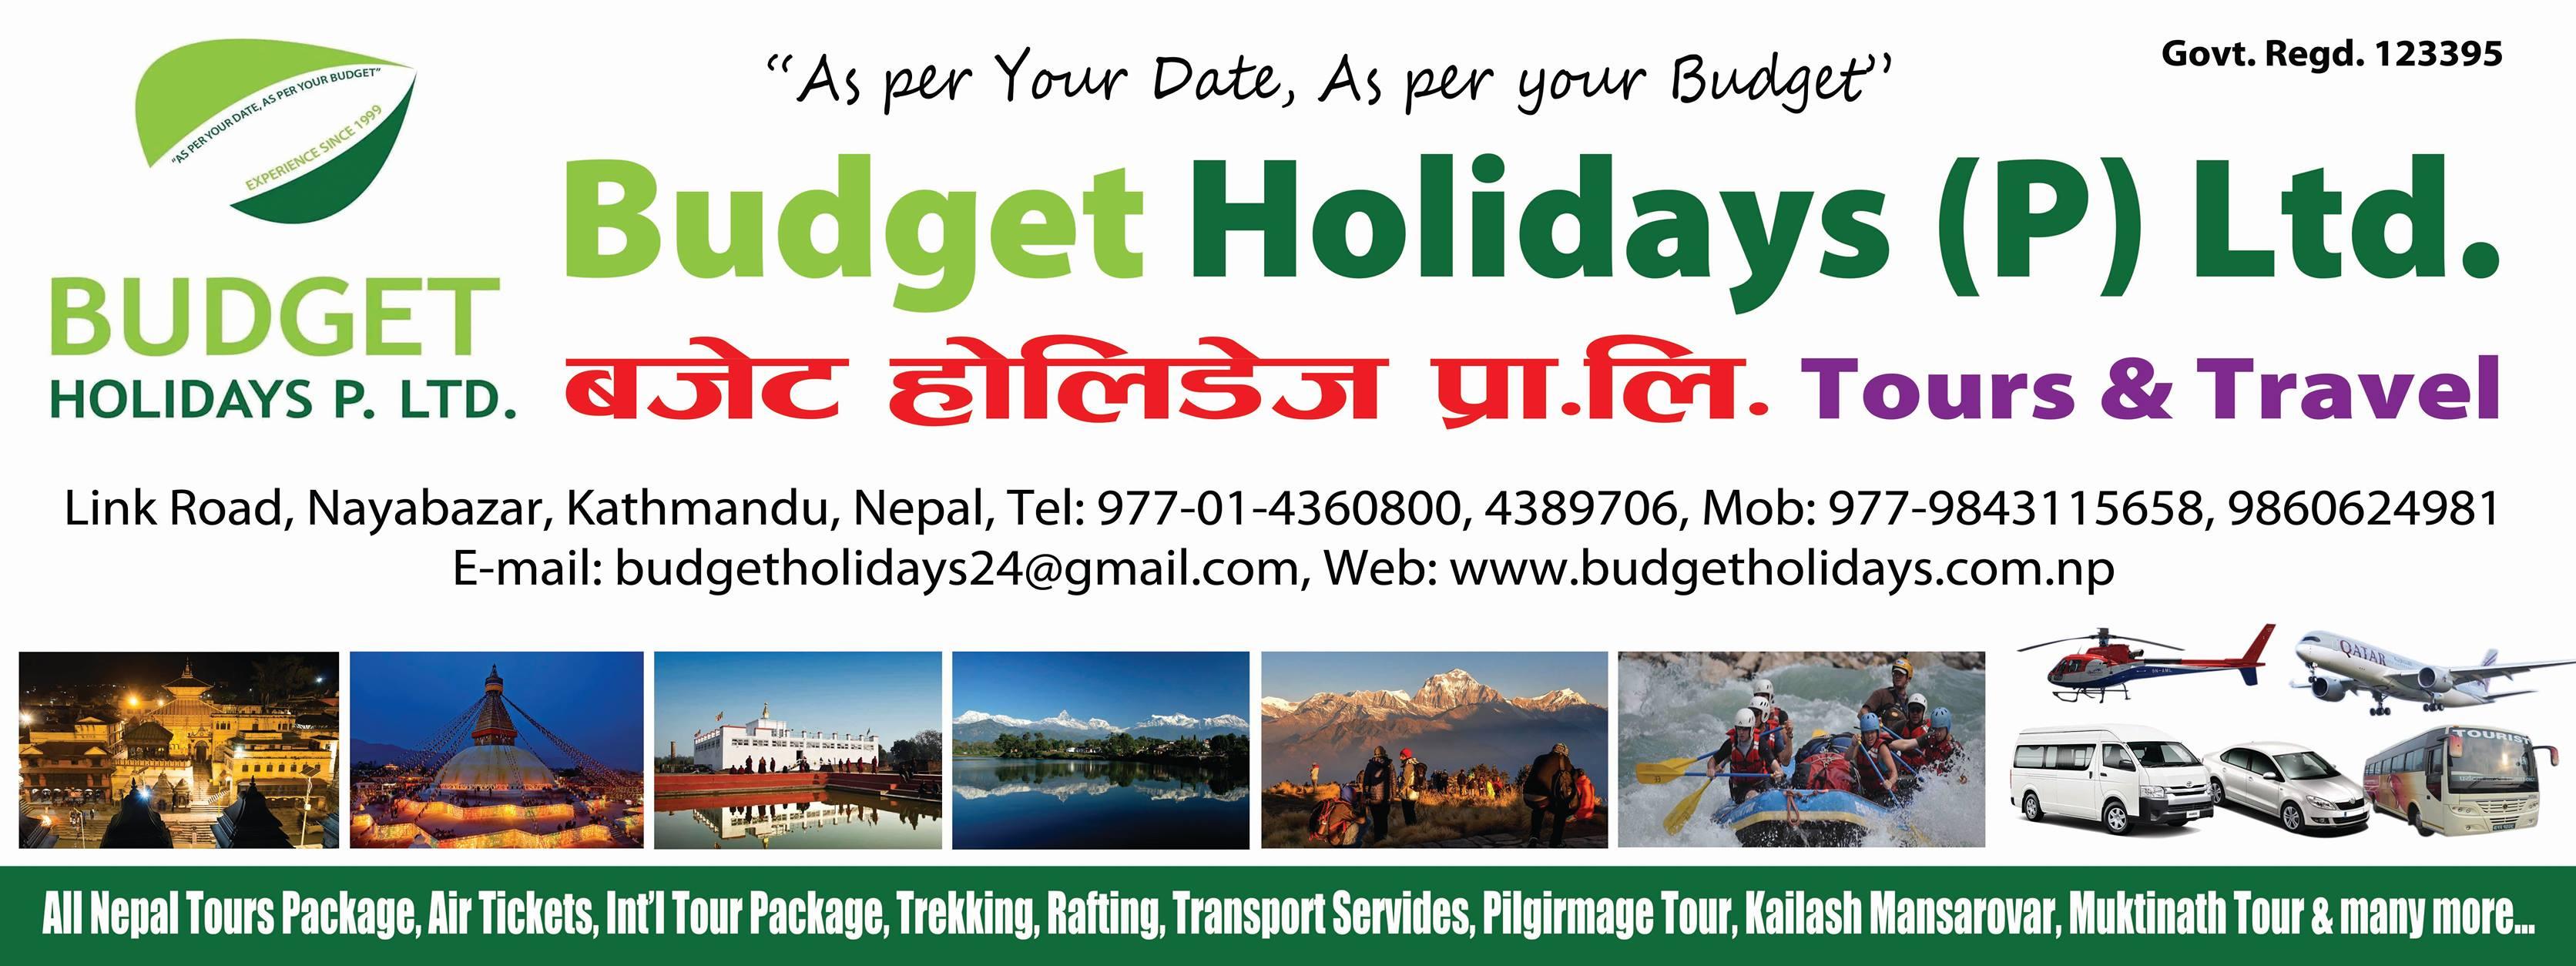 Budget Holidays Pvt.Ltd